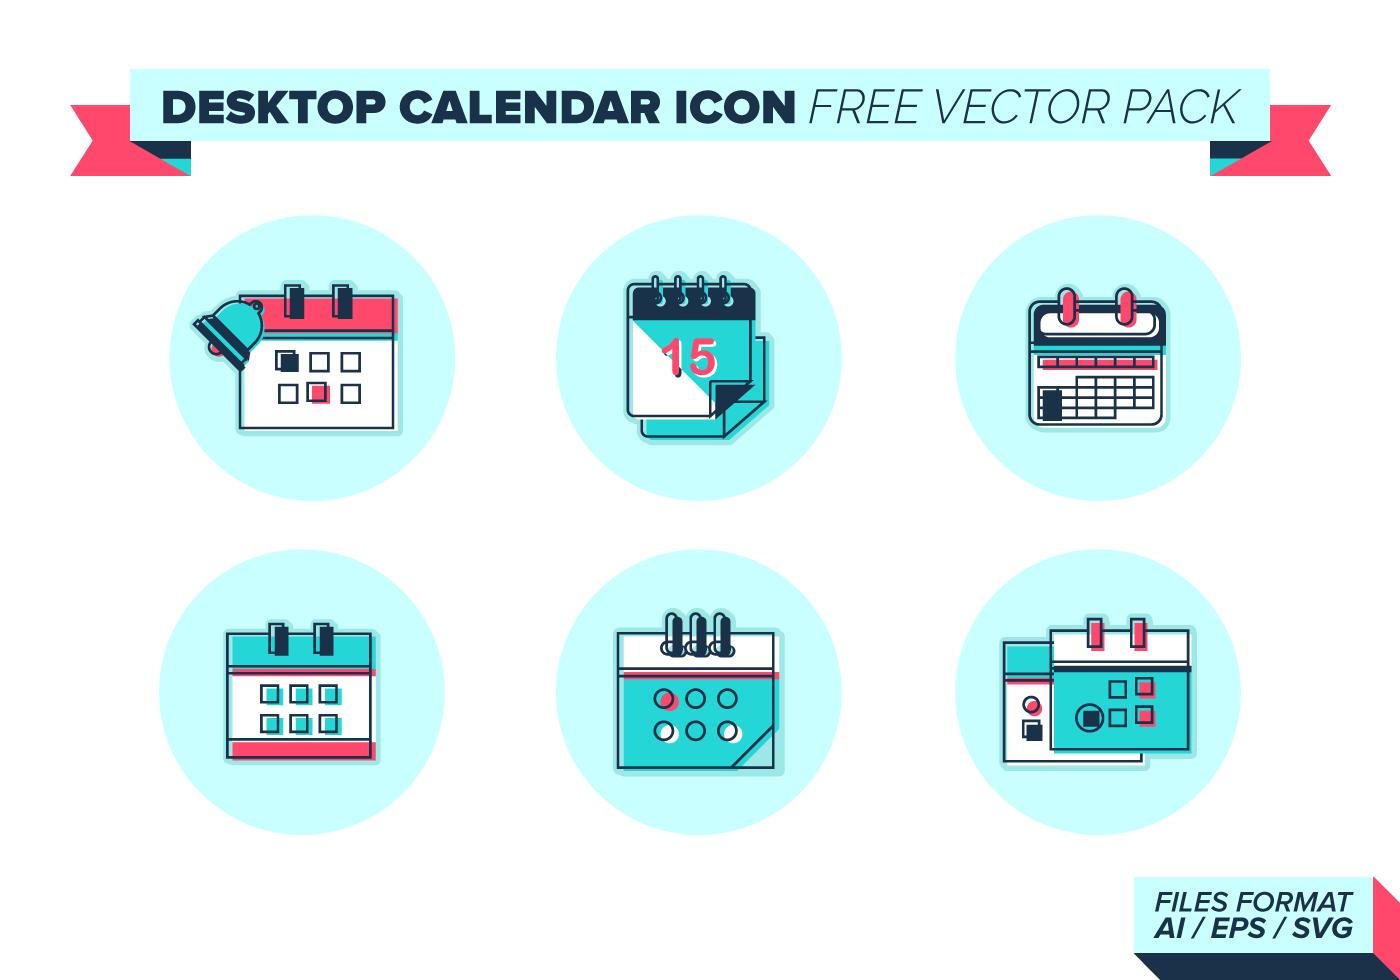 Calendar Design Free Vector : Desktop calendar icon vector pack download free